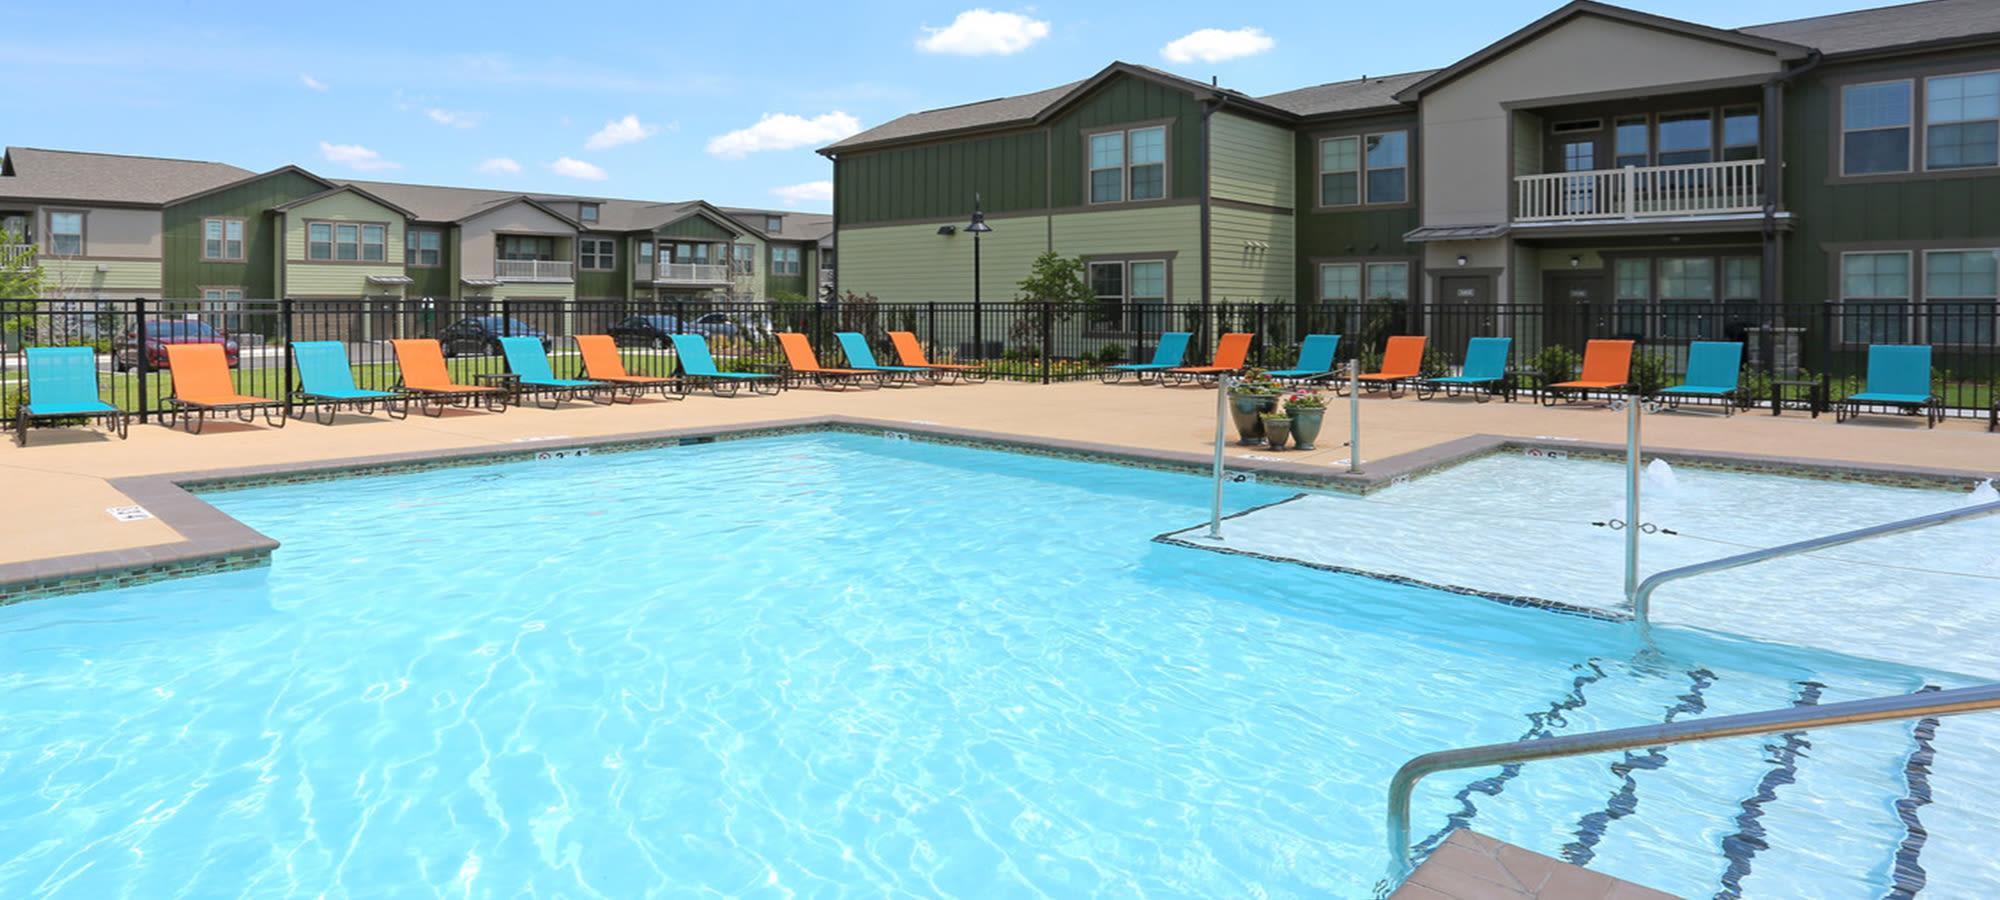 Apartments in Tulsa, OK